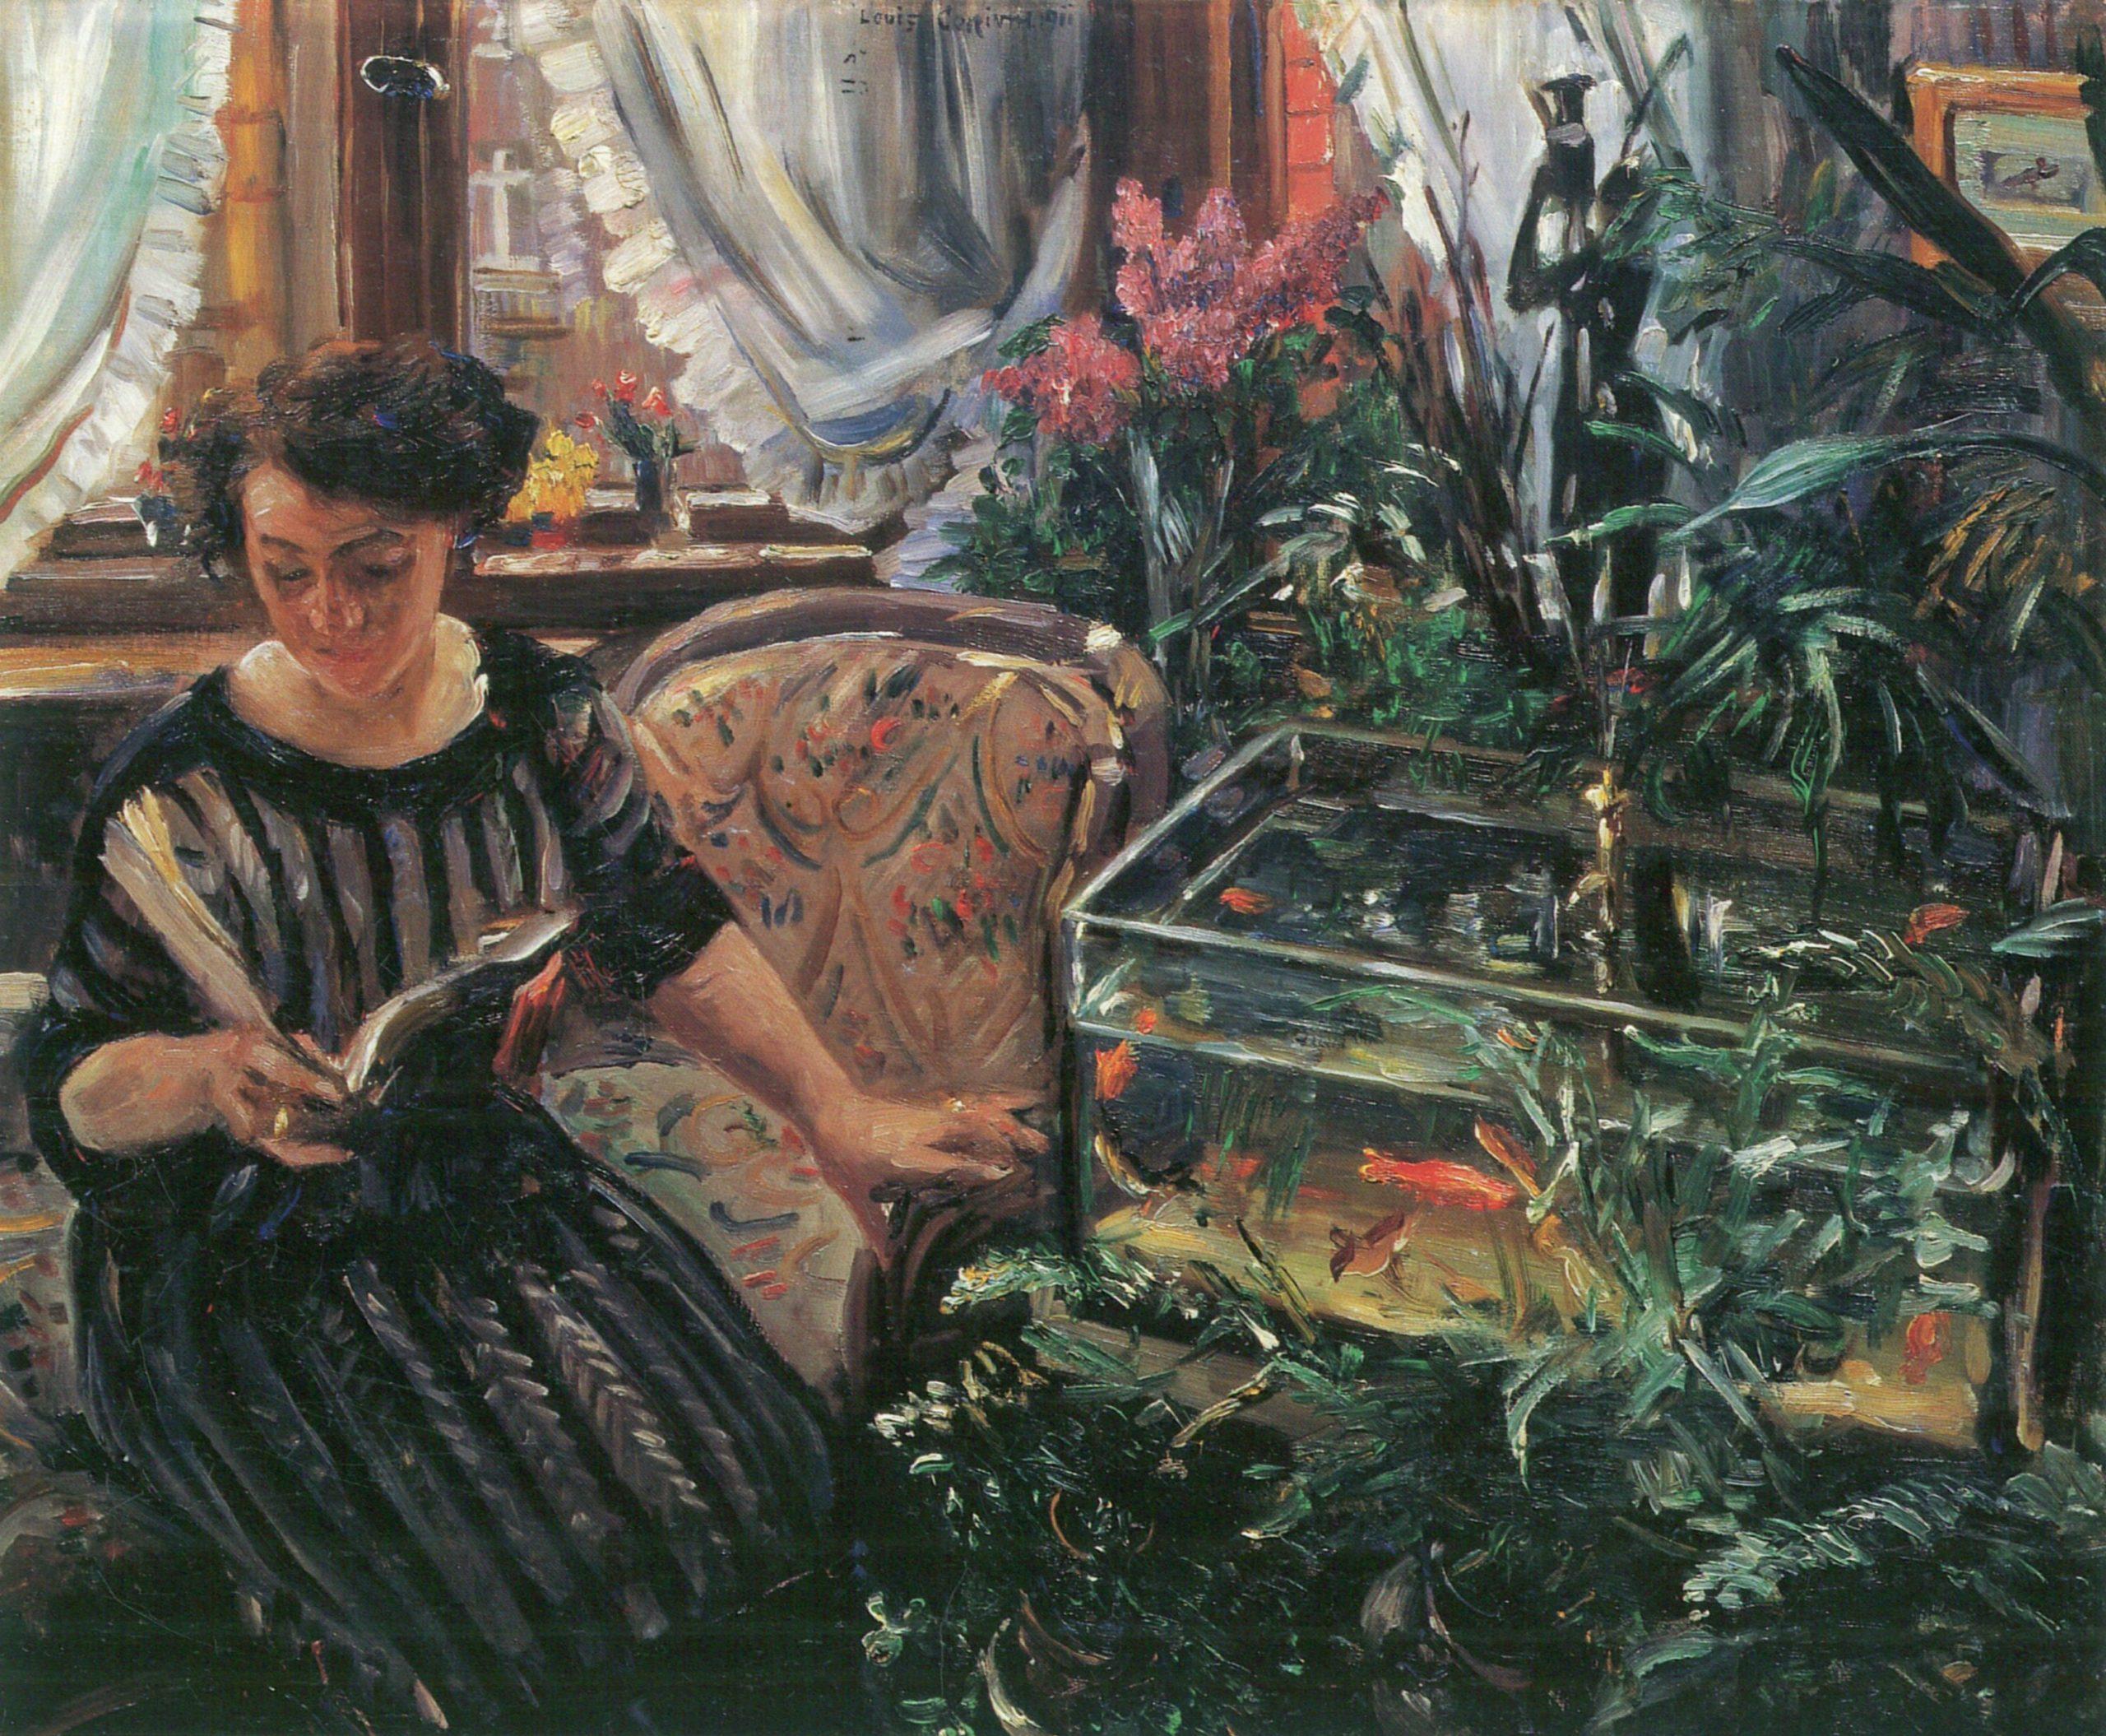 Lovis Corinth. Dame am Goldfischbassin. 1911. Öl / Leinwand